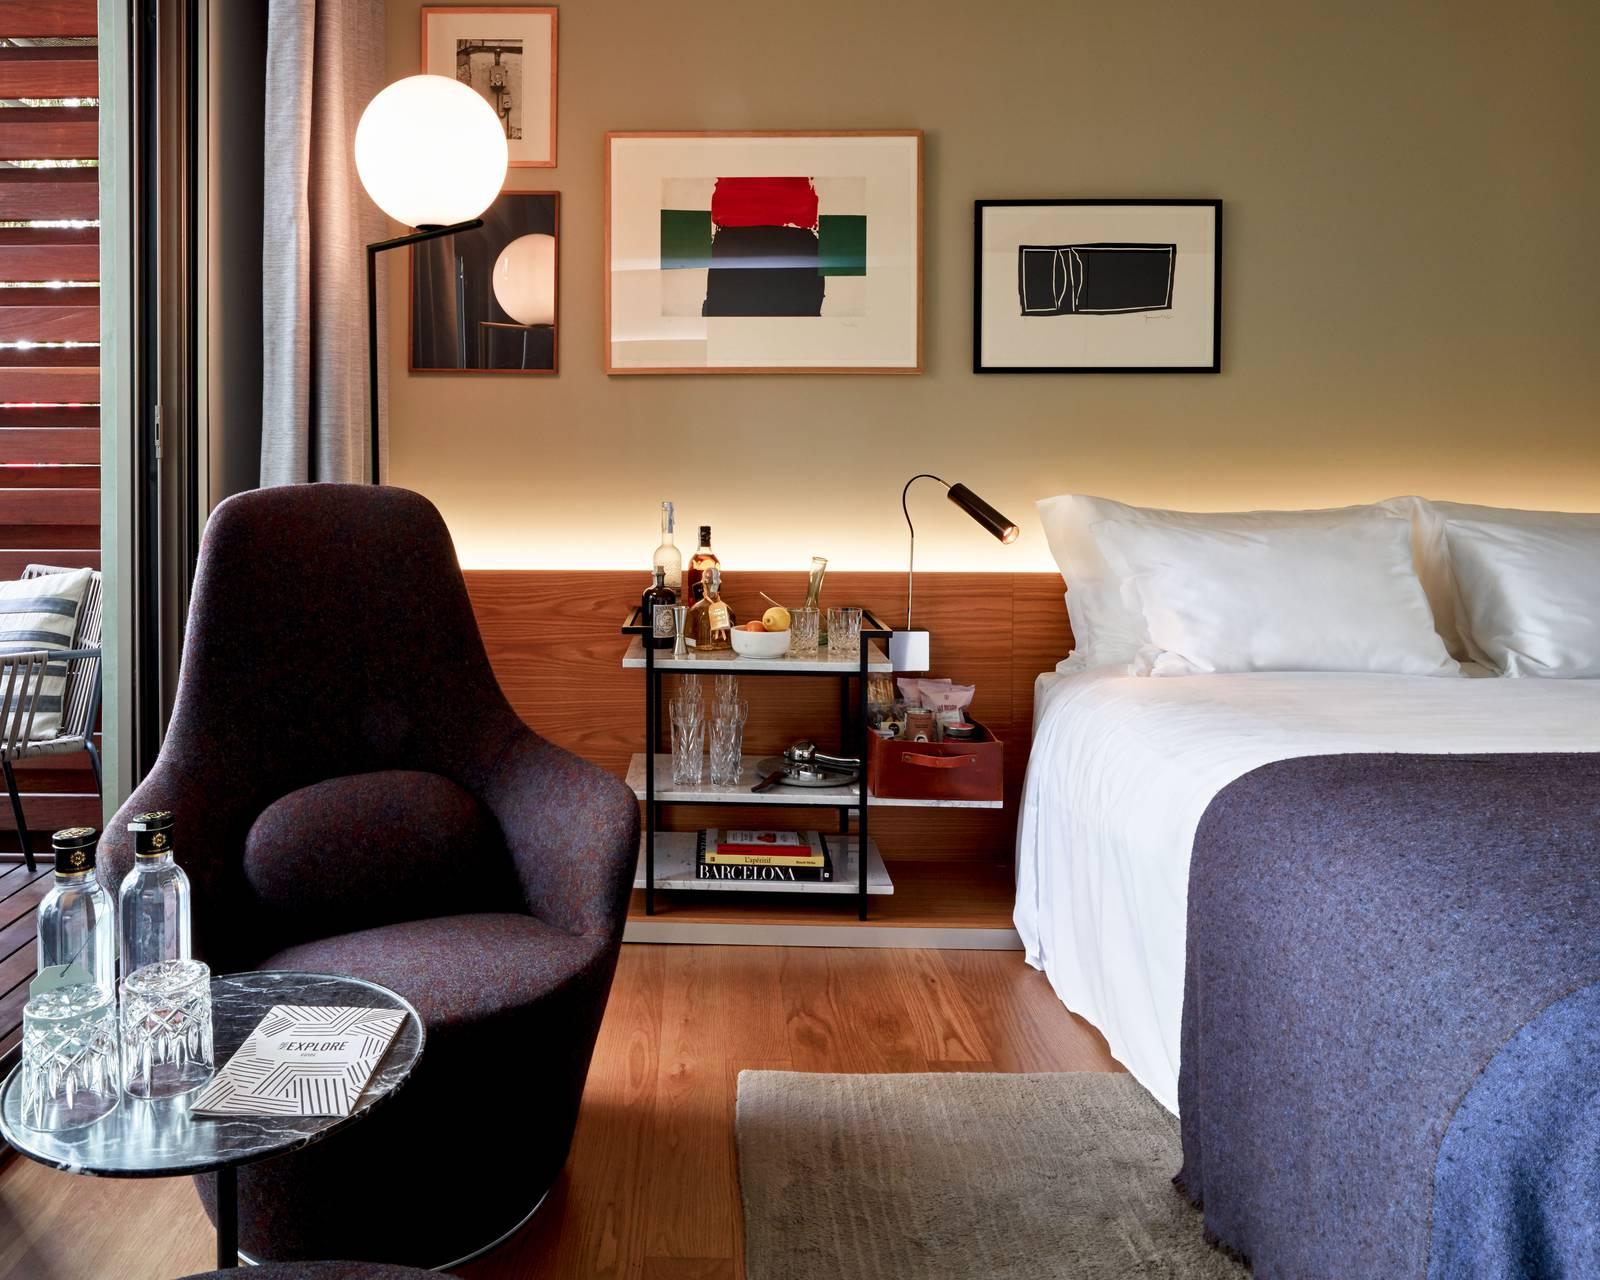 sir-victor-barcelona-rooms-deluxe (2).jpg